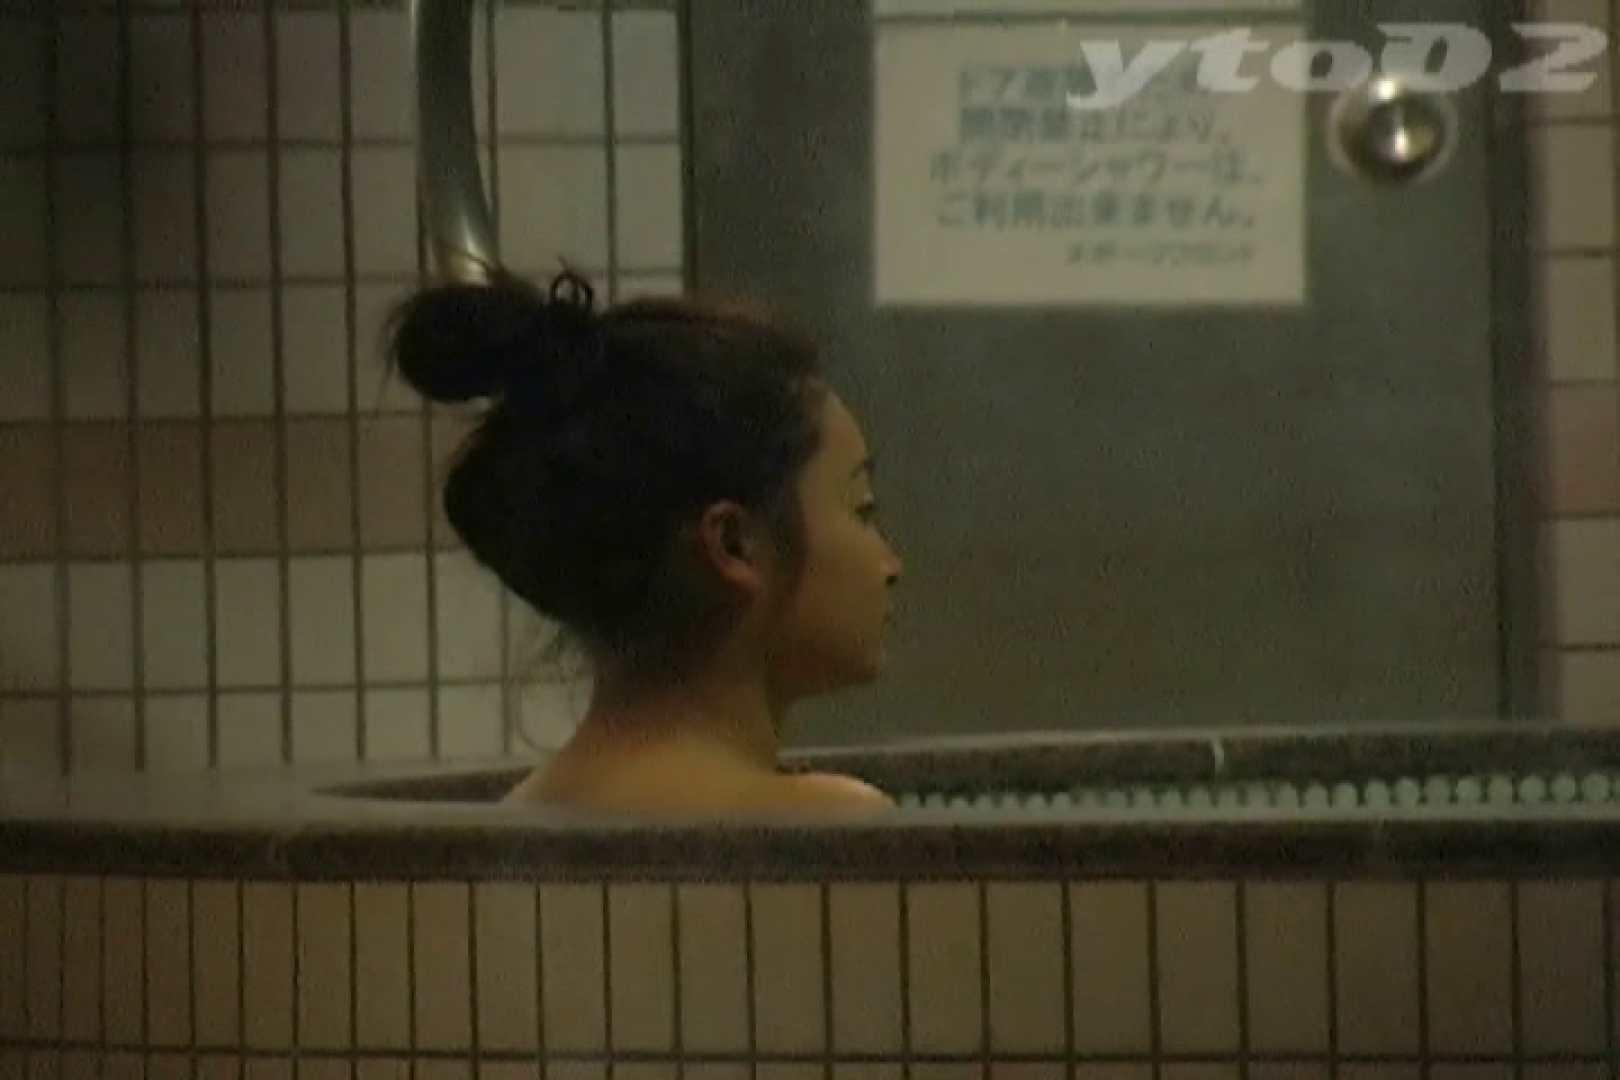 ▲復活限定▲合宿ホテル女風呂盗撮 Vol.11 入浴  79pic 78